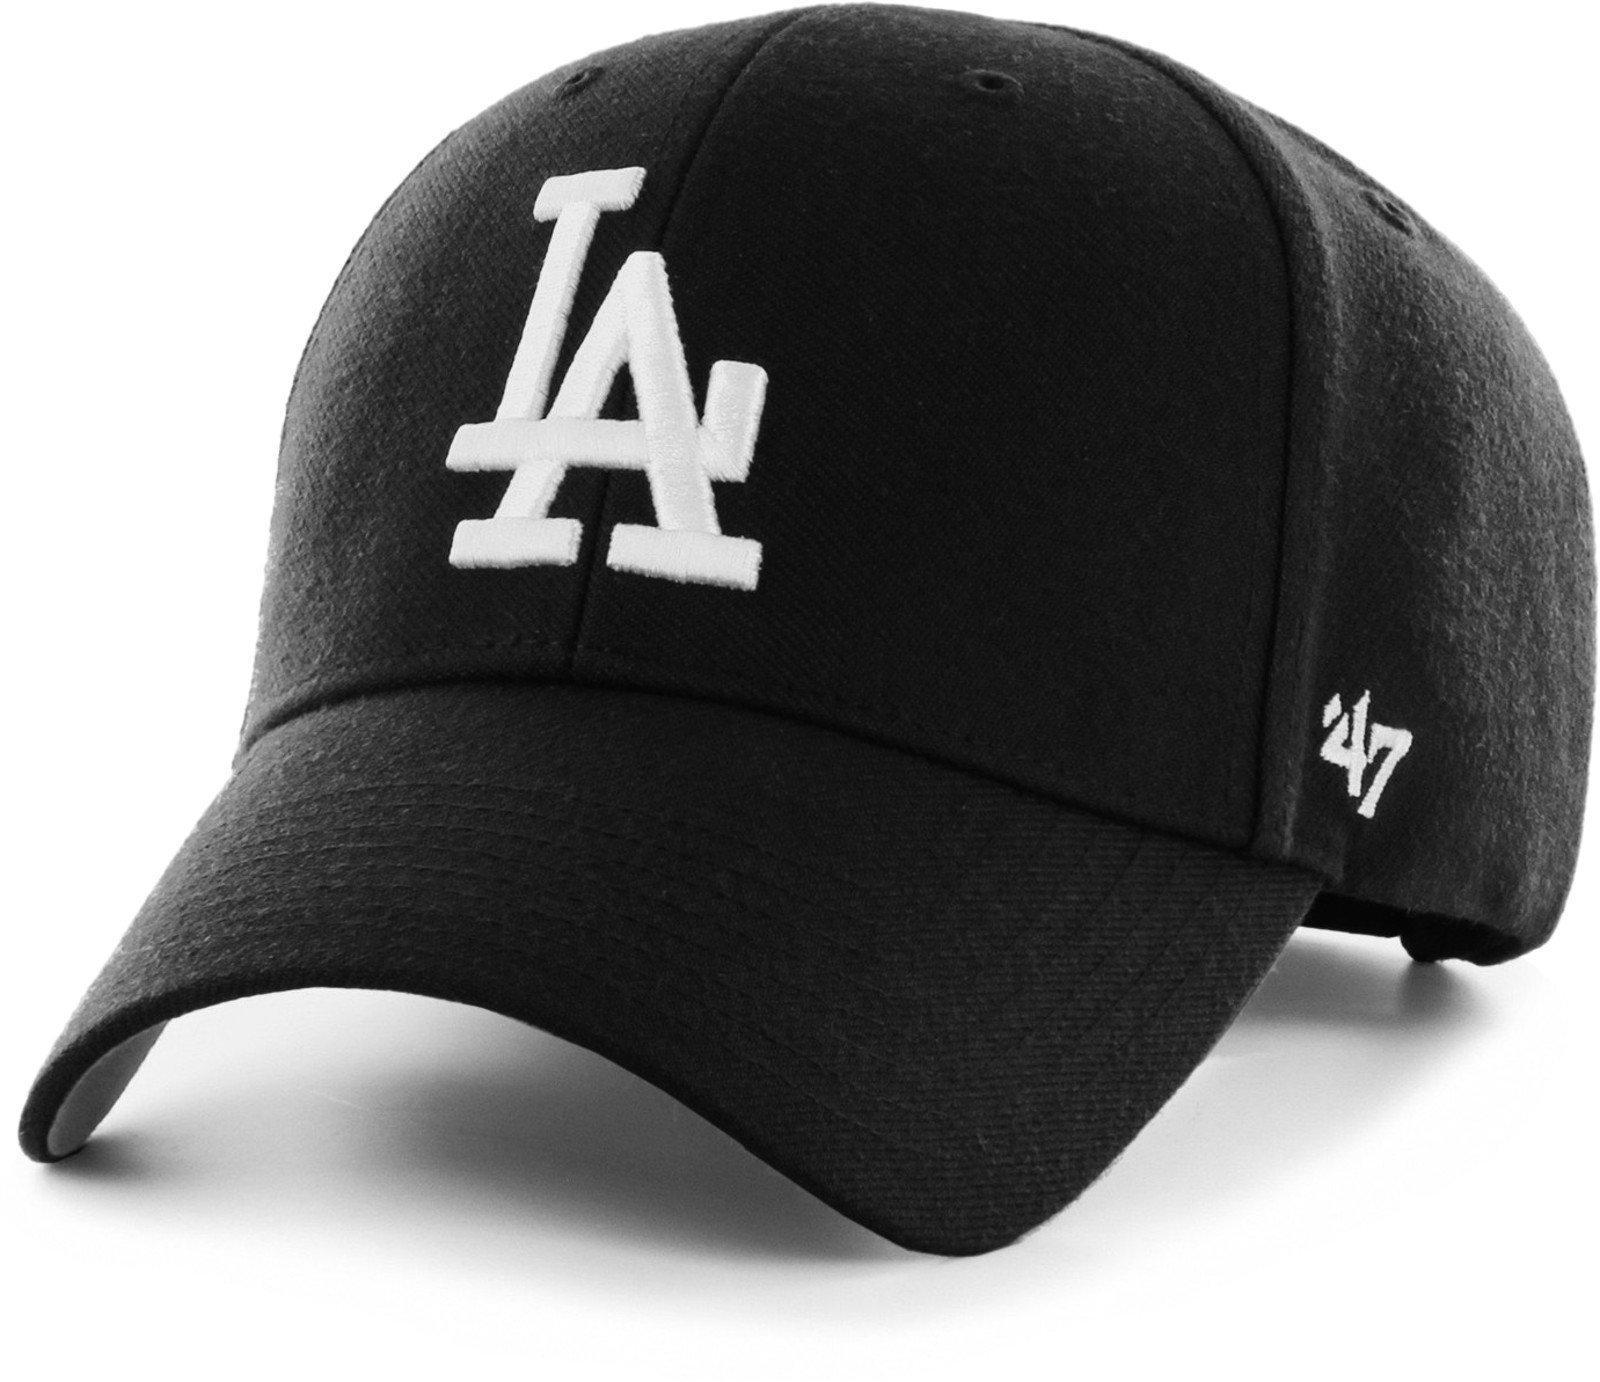 2ebfe12944a 47 Brand Mlb Los Angeles Dodgers  47 Mvp Adjustable Velcro Strap ...